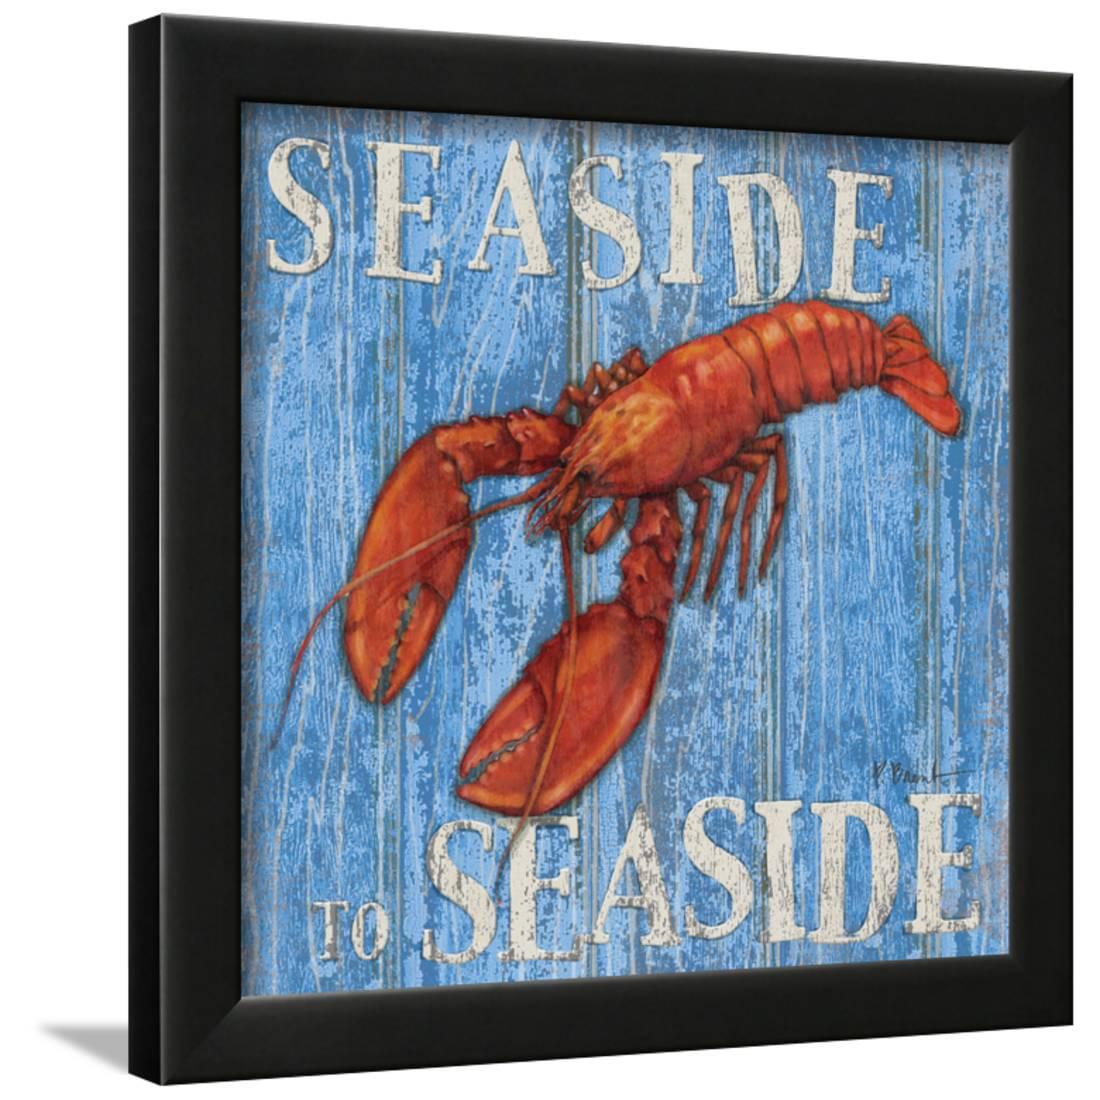 Coastal USA Lobster Framed Print Wall Artwork By Paul Brent by Art.com